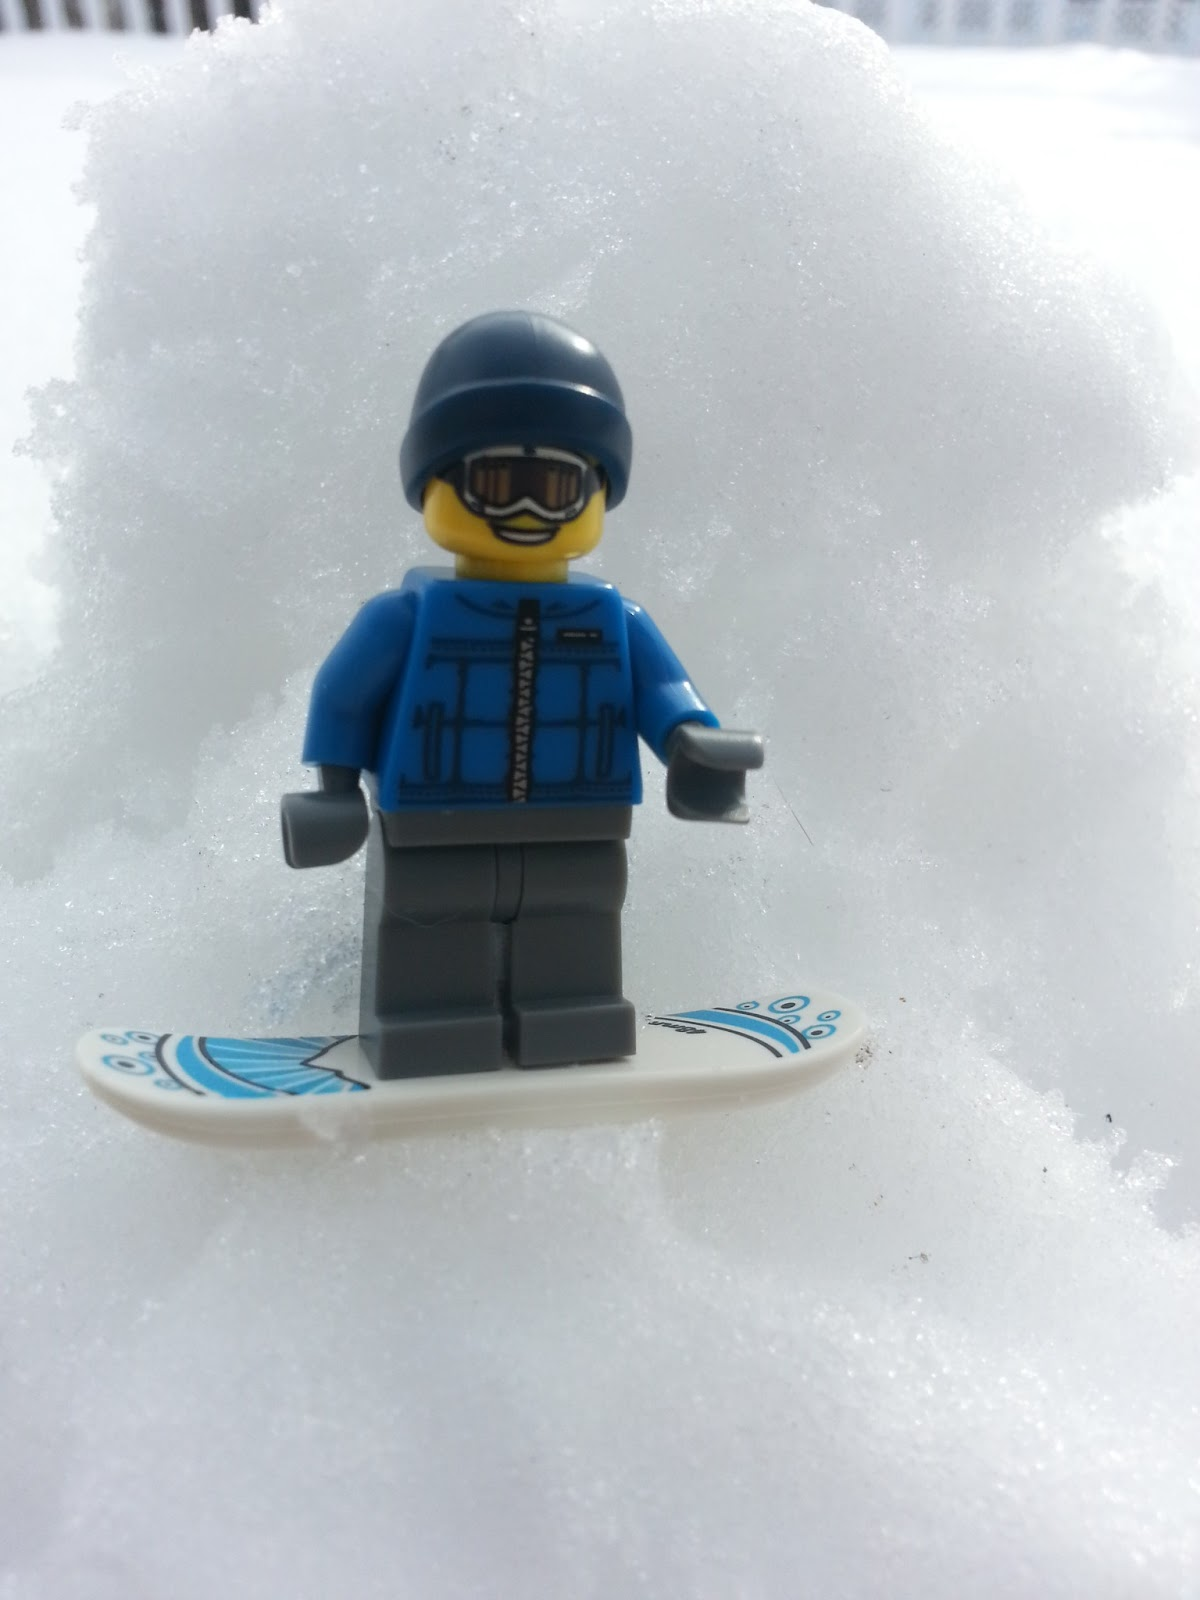 Lego Minifigures Snowboarder Minifigure Museum Snowboarder